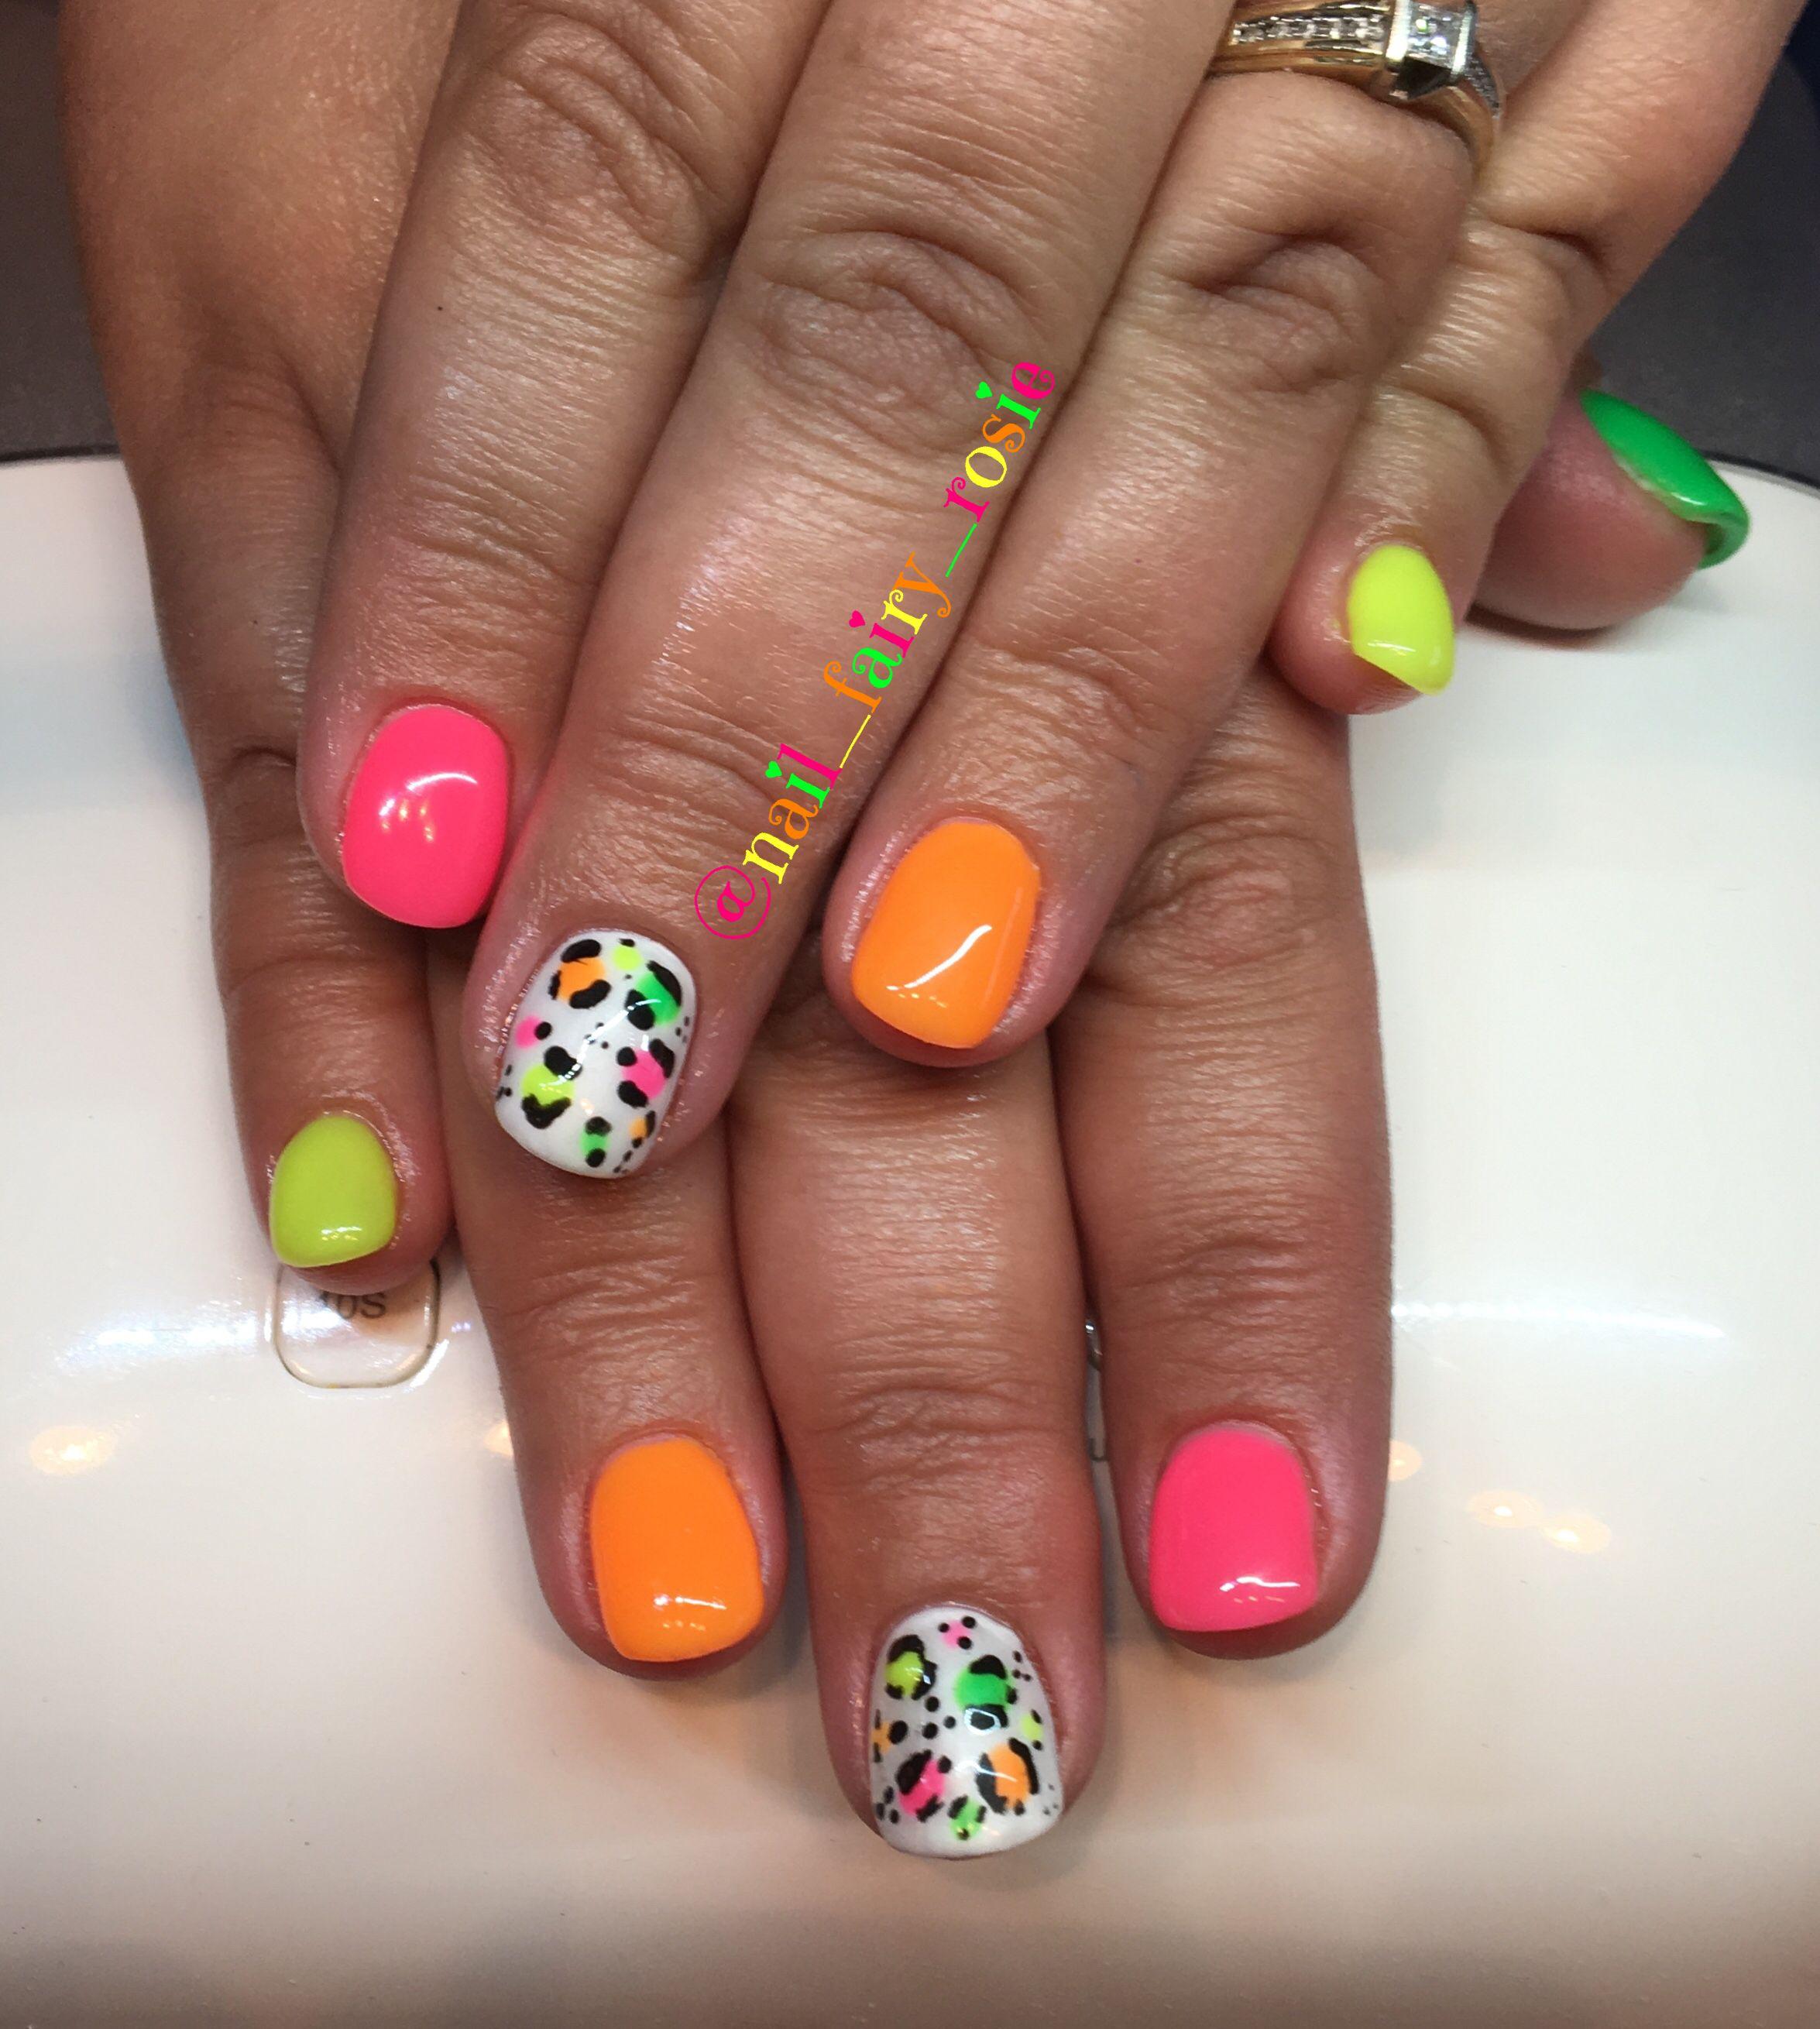 Neon And Leopard Print Gel Nail Design Gel Nail Designs Nails Gel Nail Design